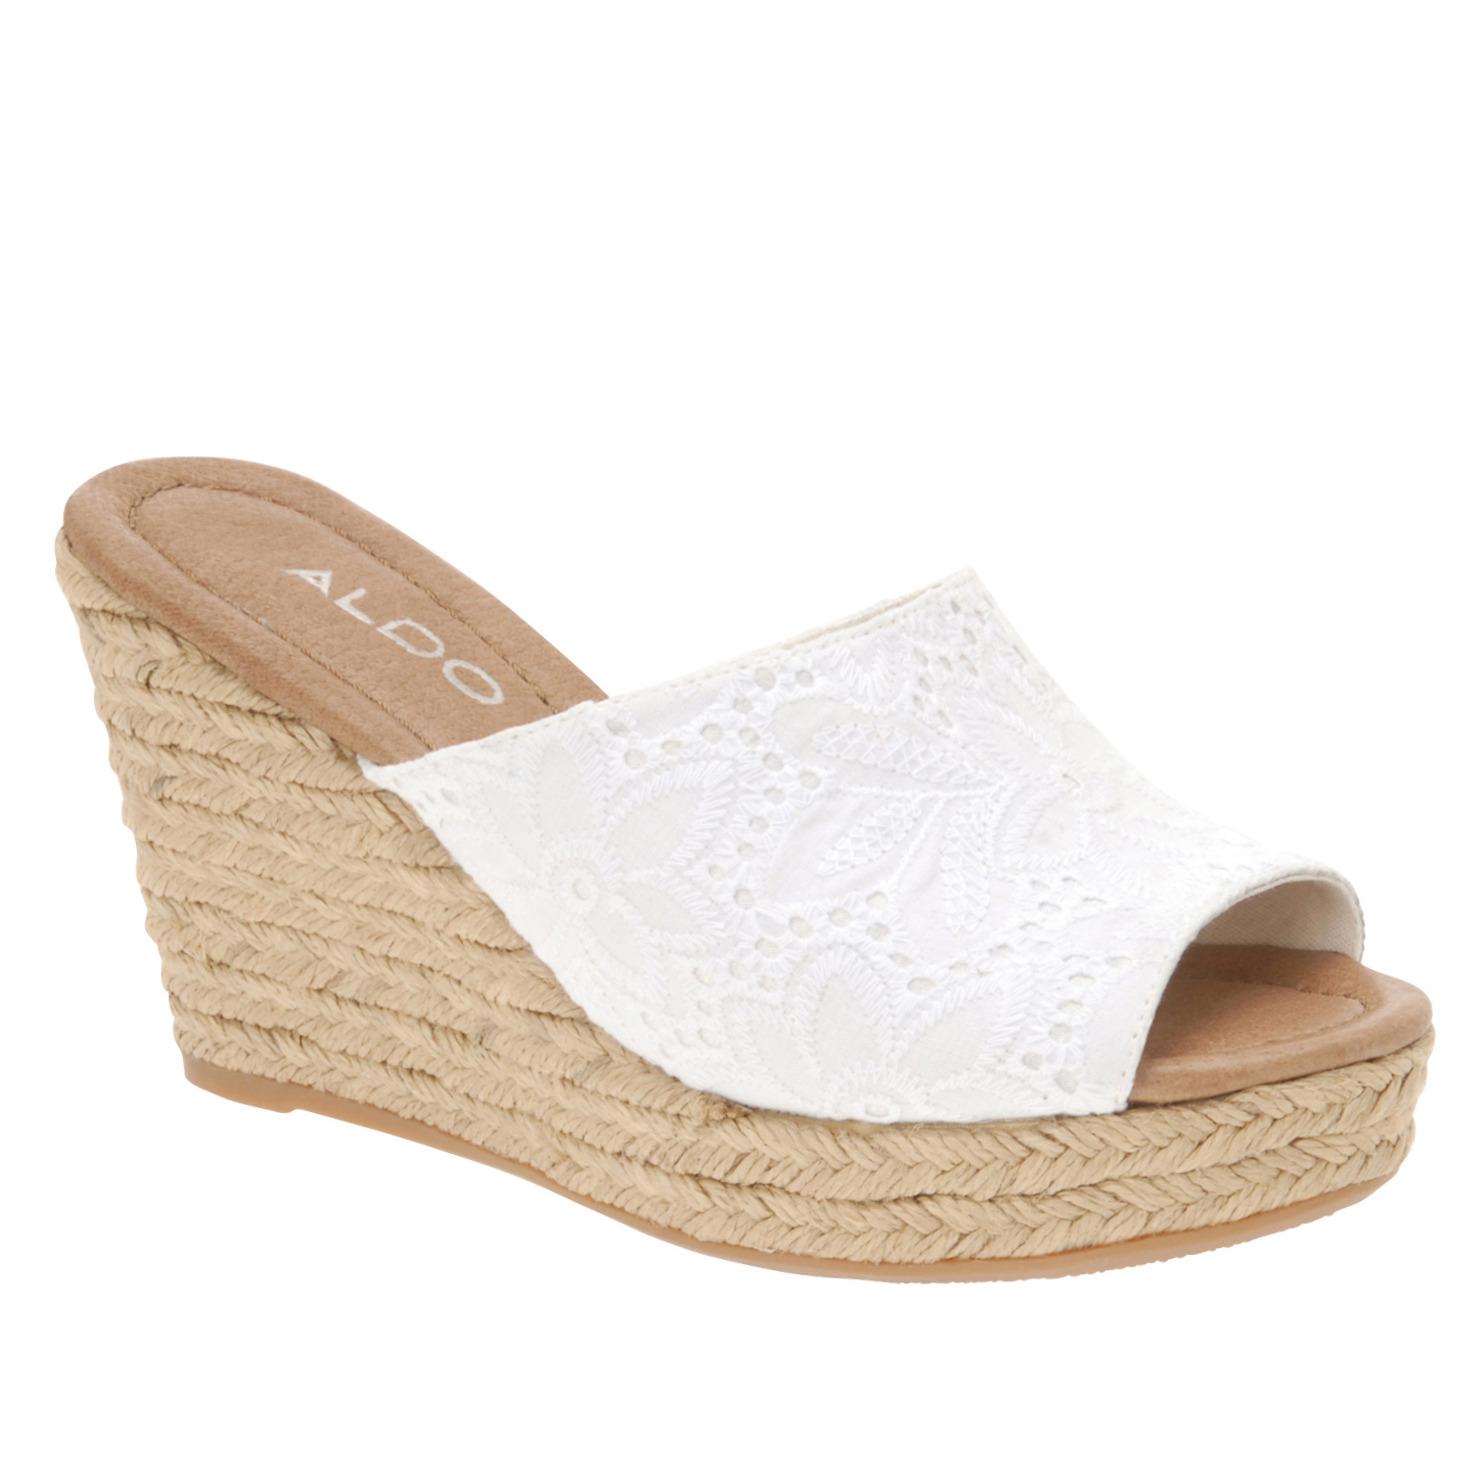 932d643e259 Lyst - ALDO Wedge Sandals in White